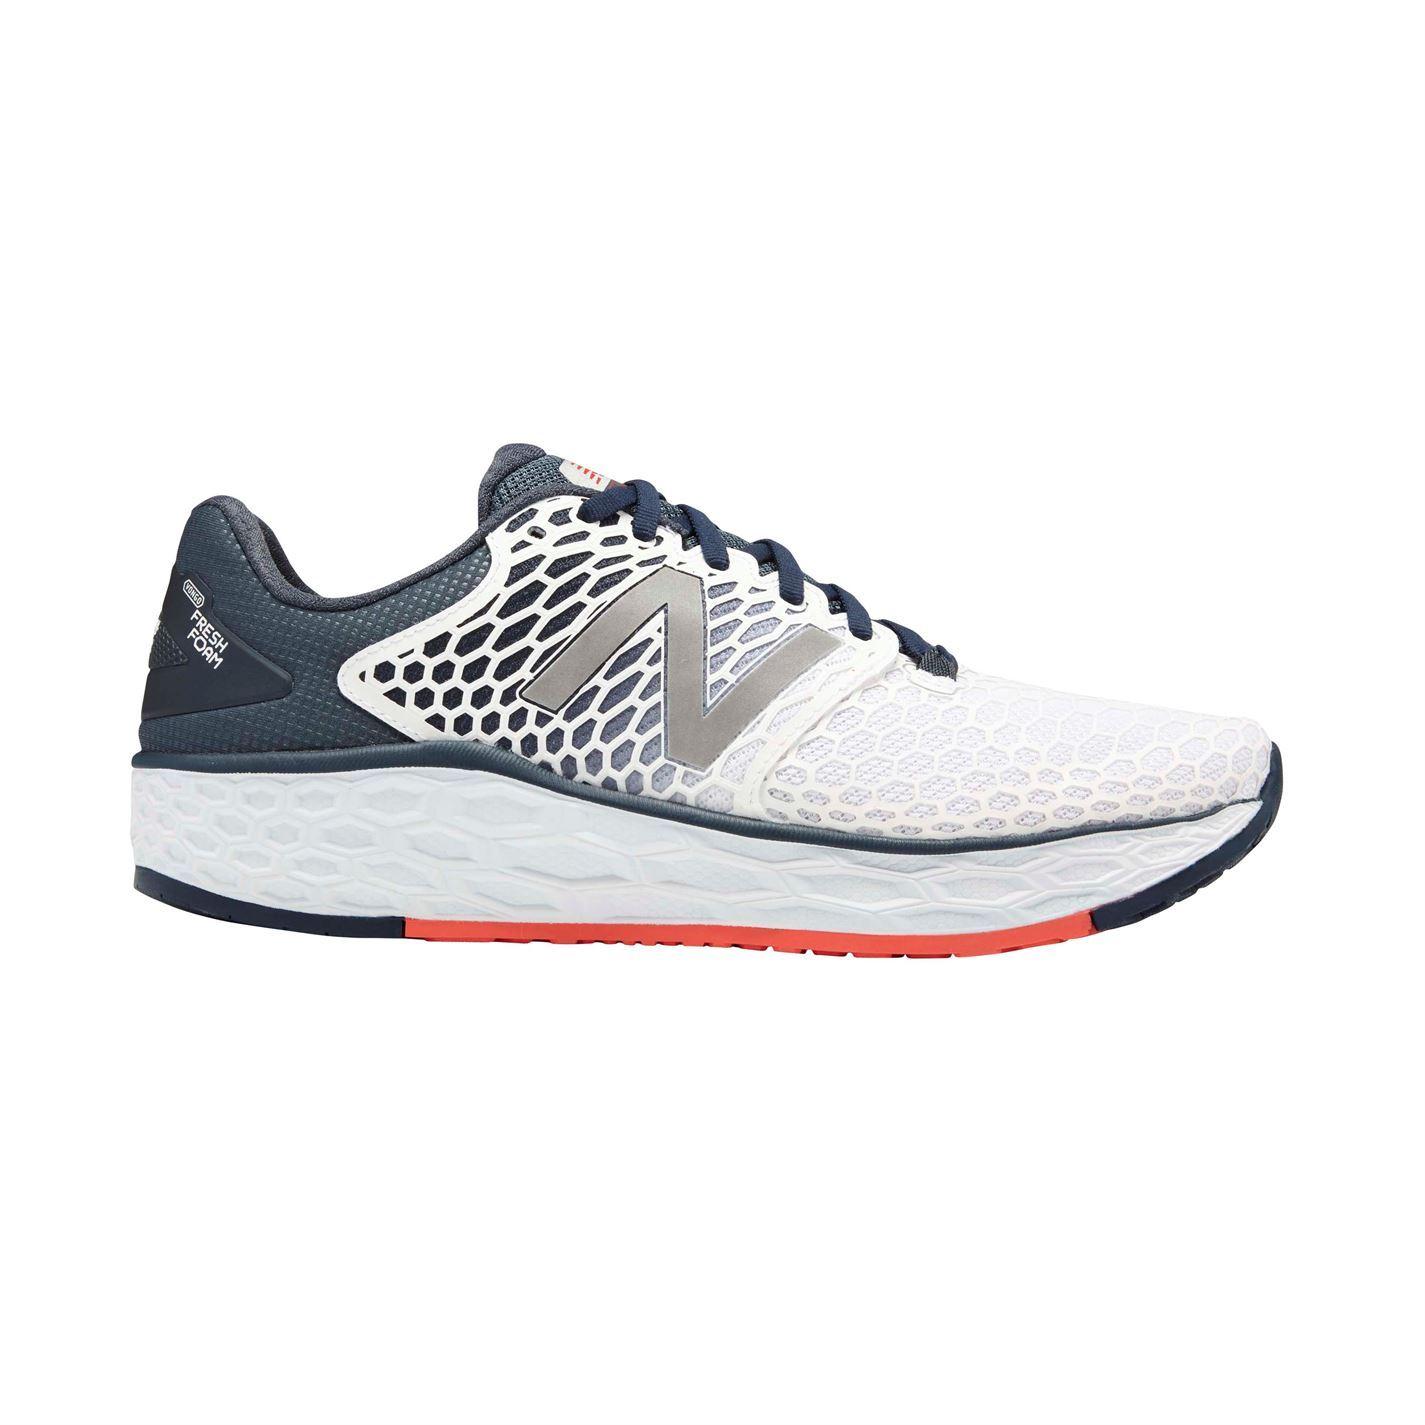 New Balance Fresh Foam Vongo v3 Running shoes shoes shoes Mens Gents Road Lightweight Mesh cfedc9